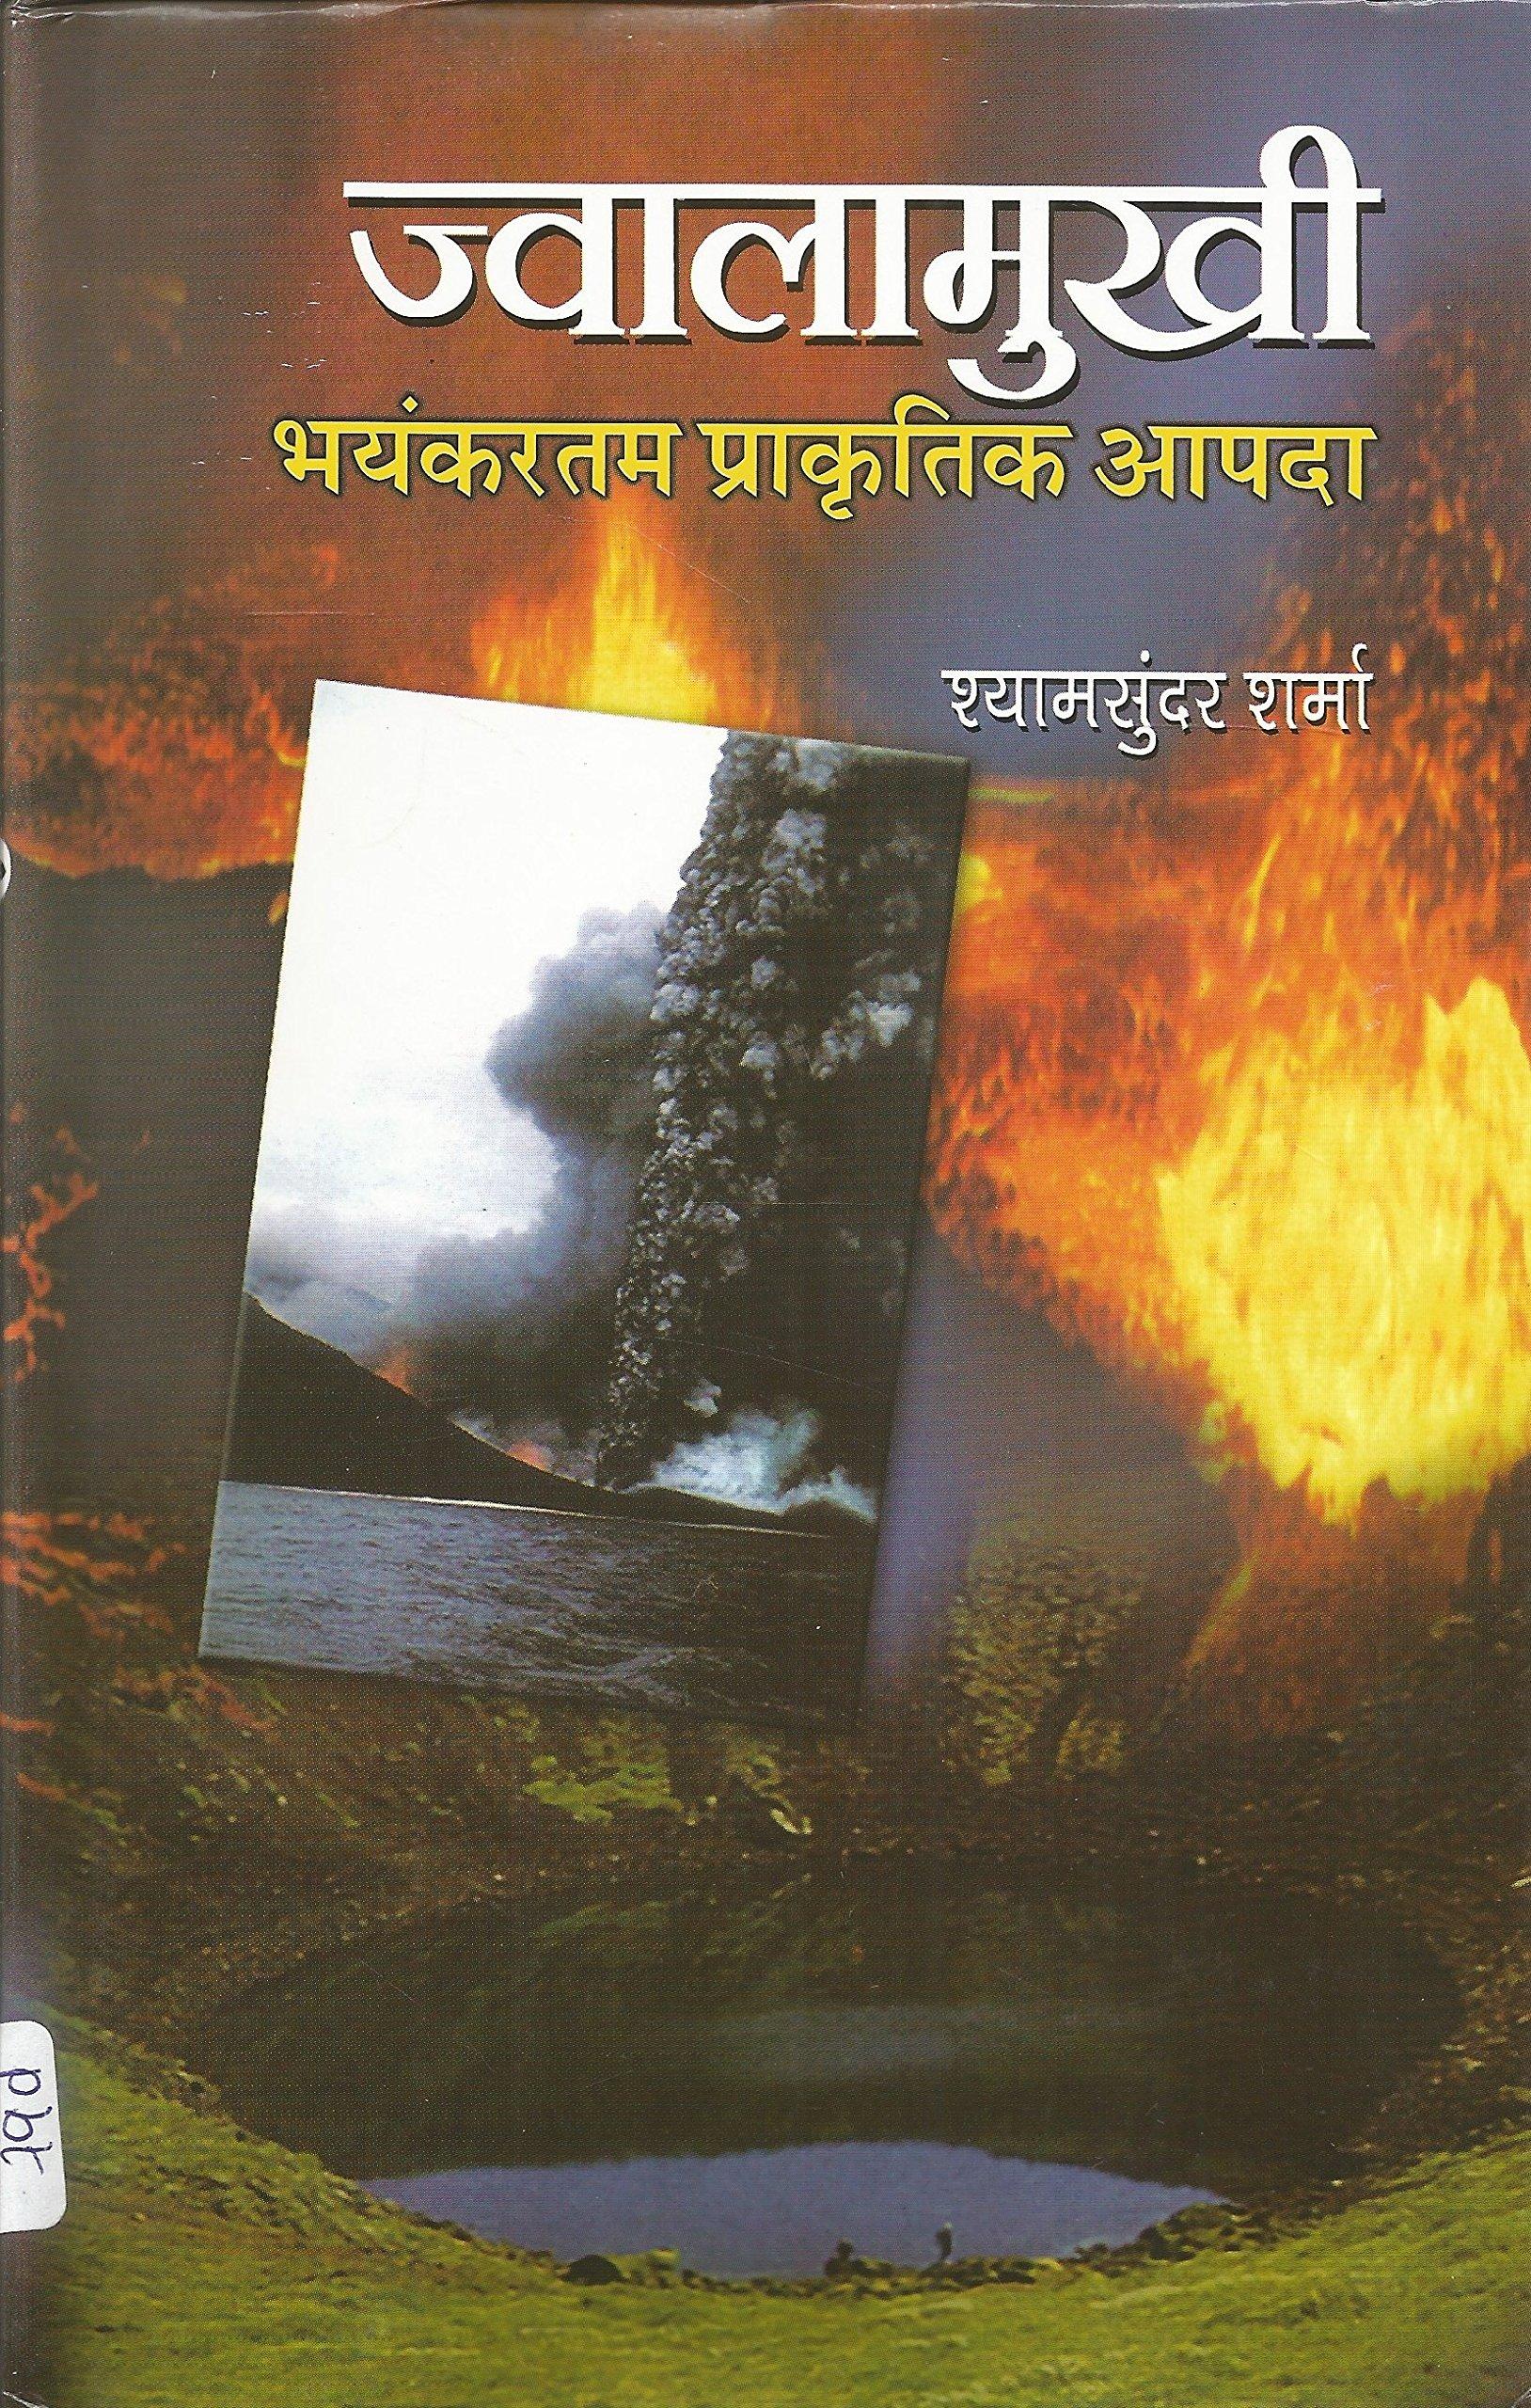 Read Online Jwalamukhi: Bhayankartam Prakritik Aapda (Hindi Edition) ebook